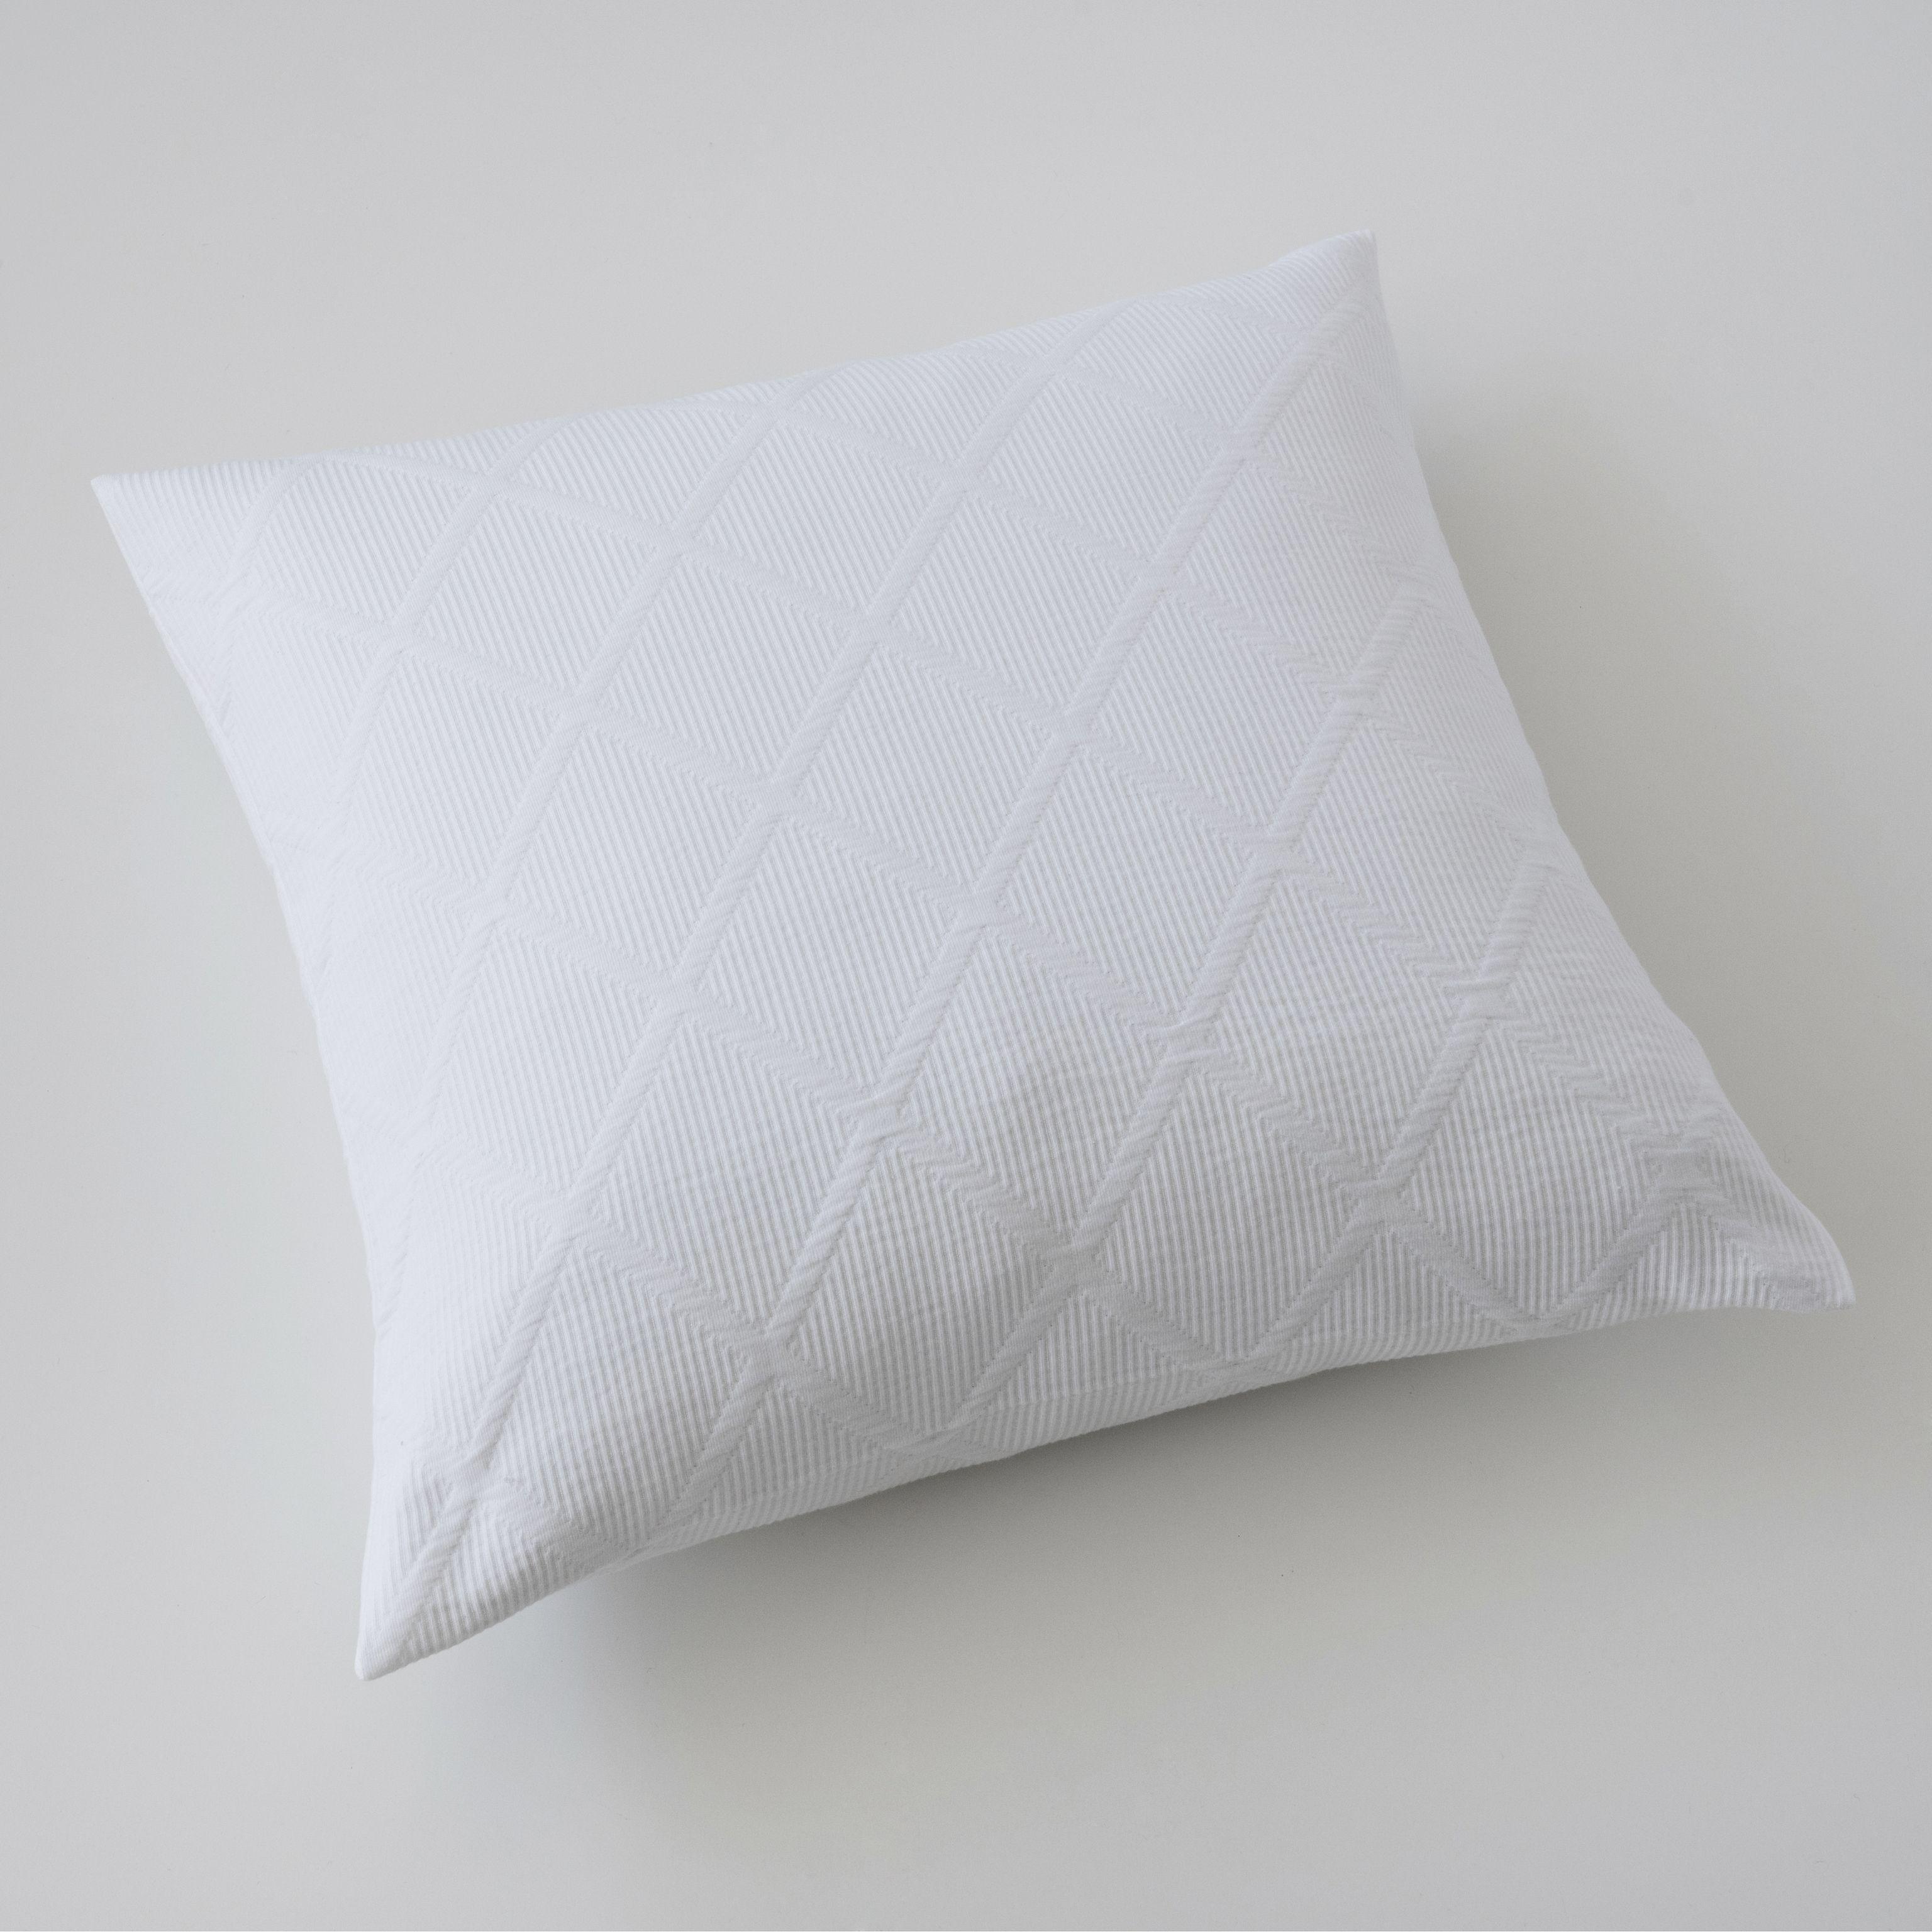 kissenbezug rauten 50 x 50 cm wei bei. Black Bedroom Furniture Sets. Home Design Ideas